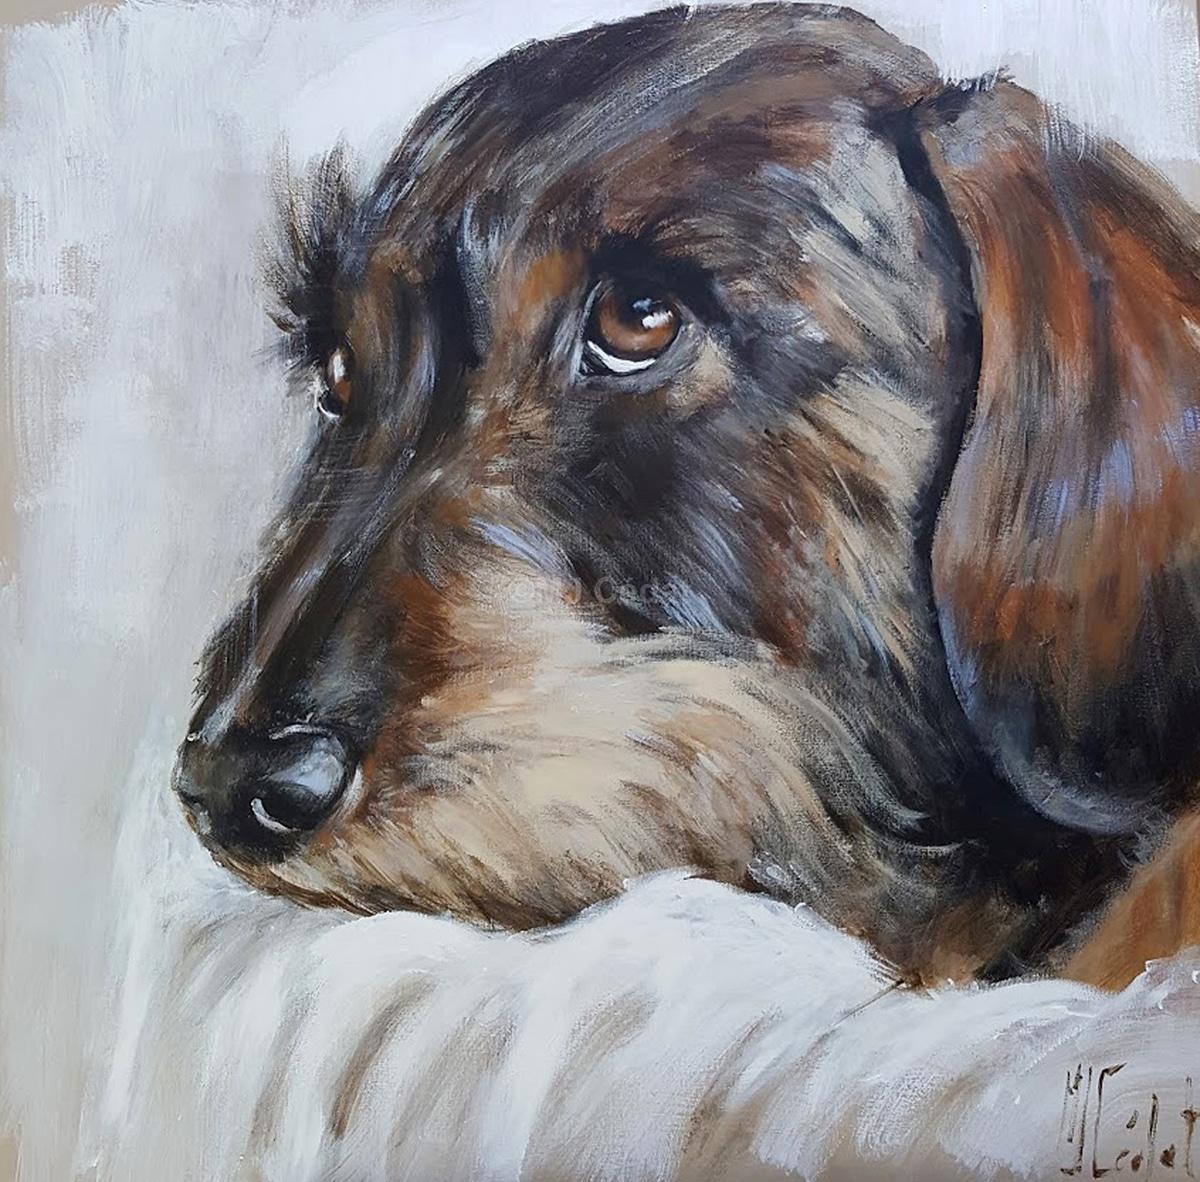 Teckel epuisé -Marie-Joëlle Cédat-artiste animalier peinture animaliere-art-animalier- peintre-animalier